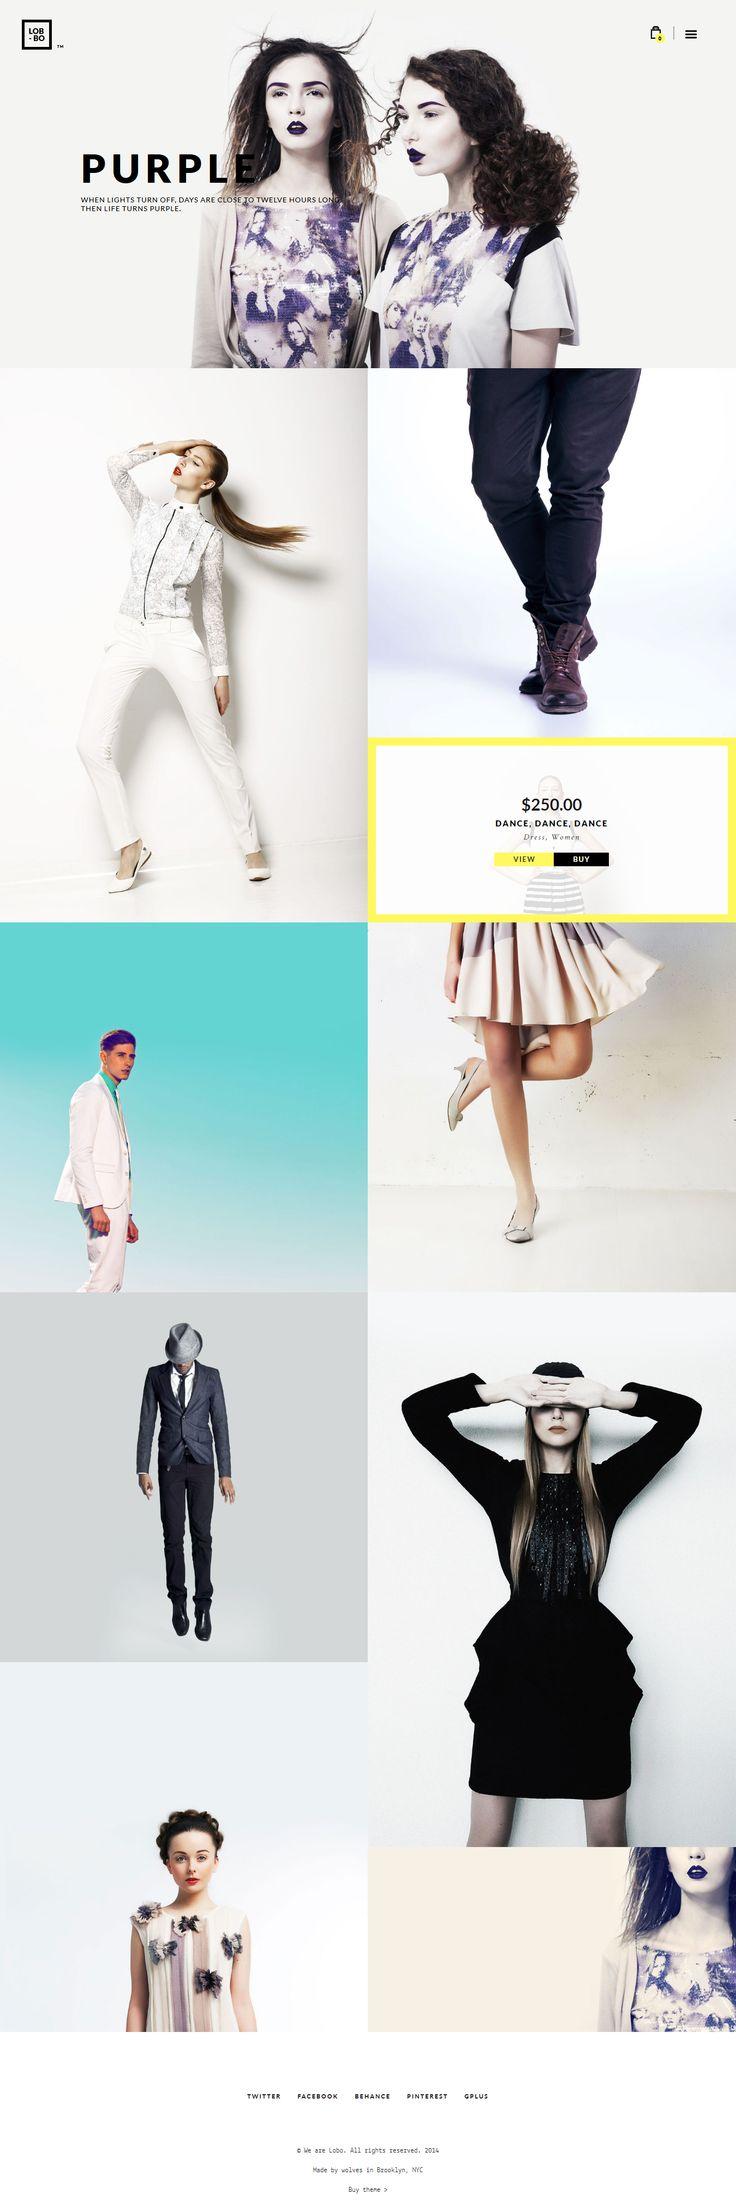 Web Design Inspiration - Graphic Design Inspiration - Portfolio - Image Gallery - Fashion